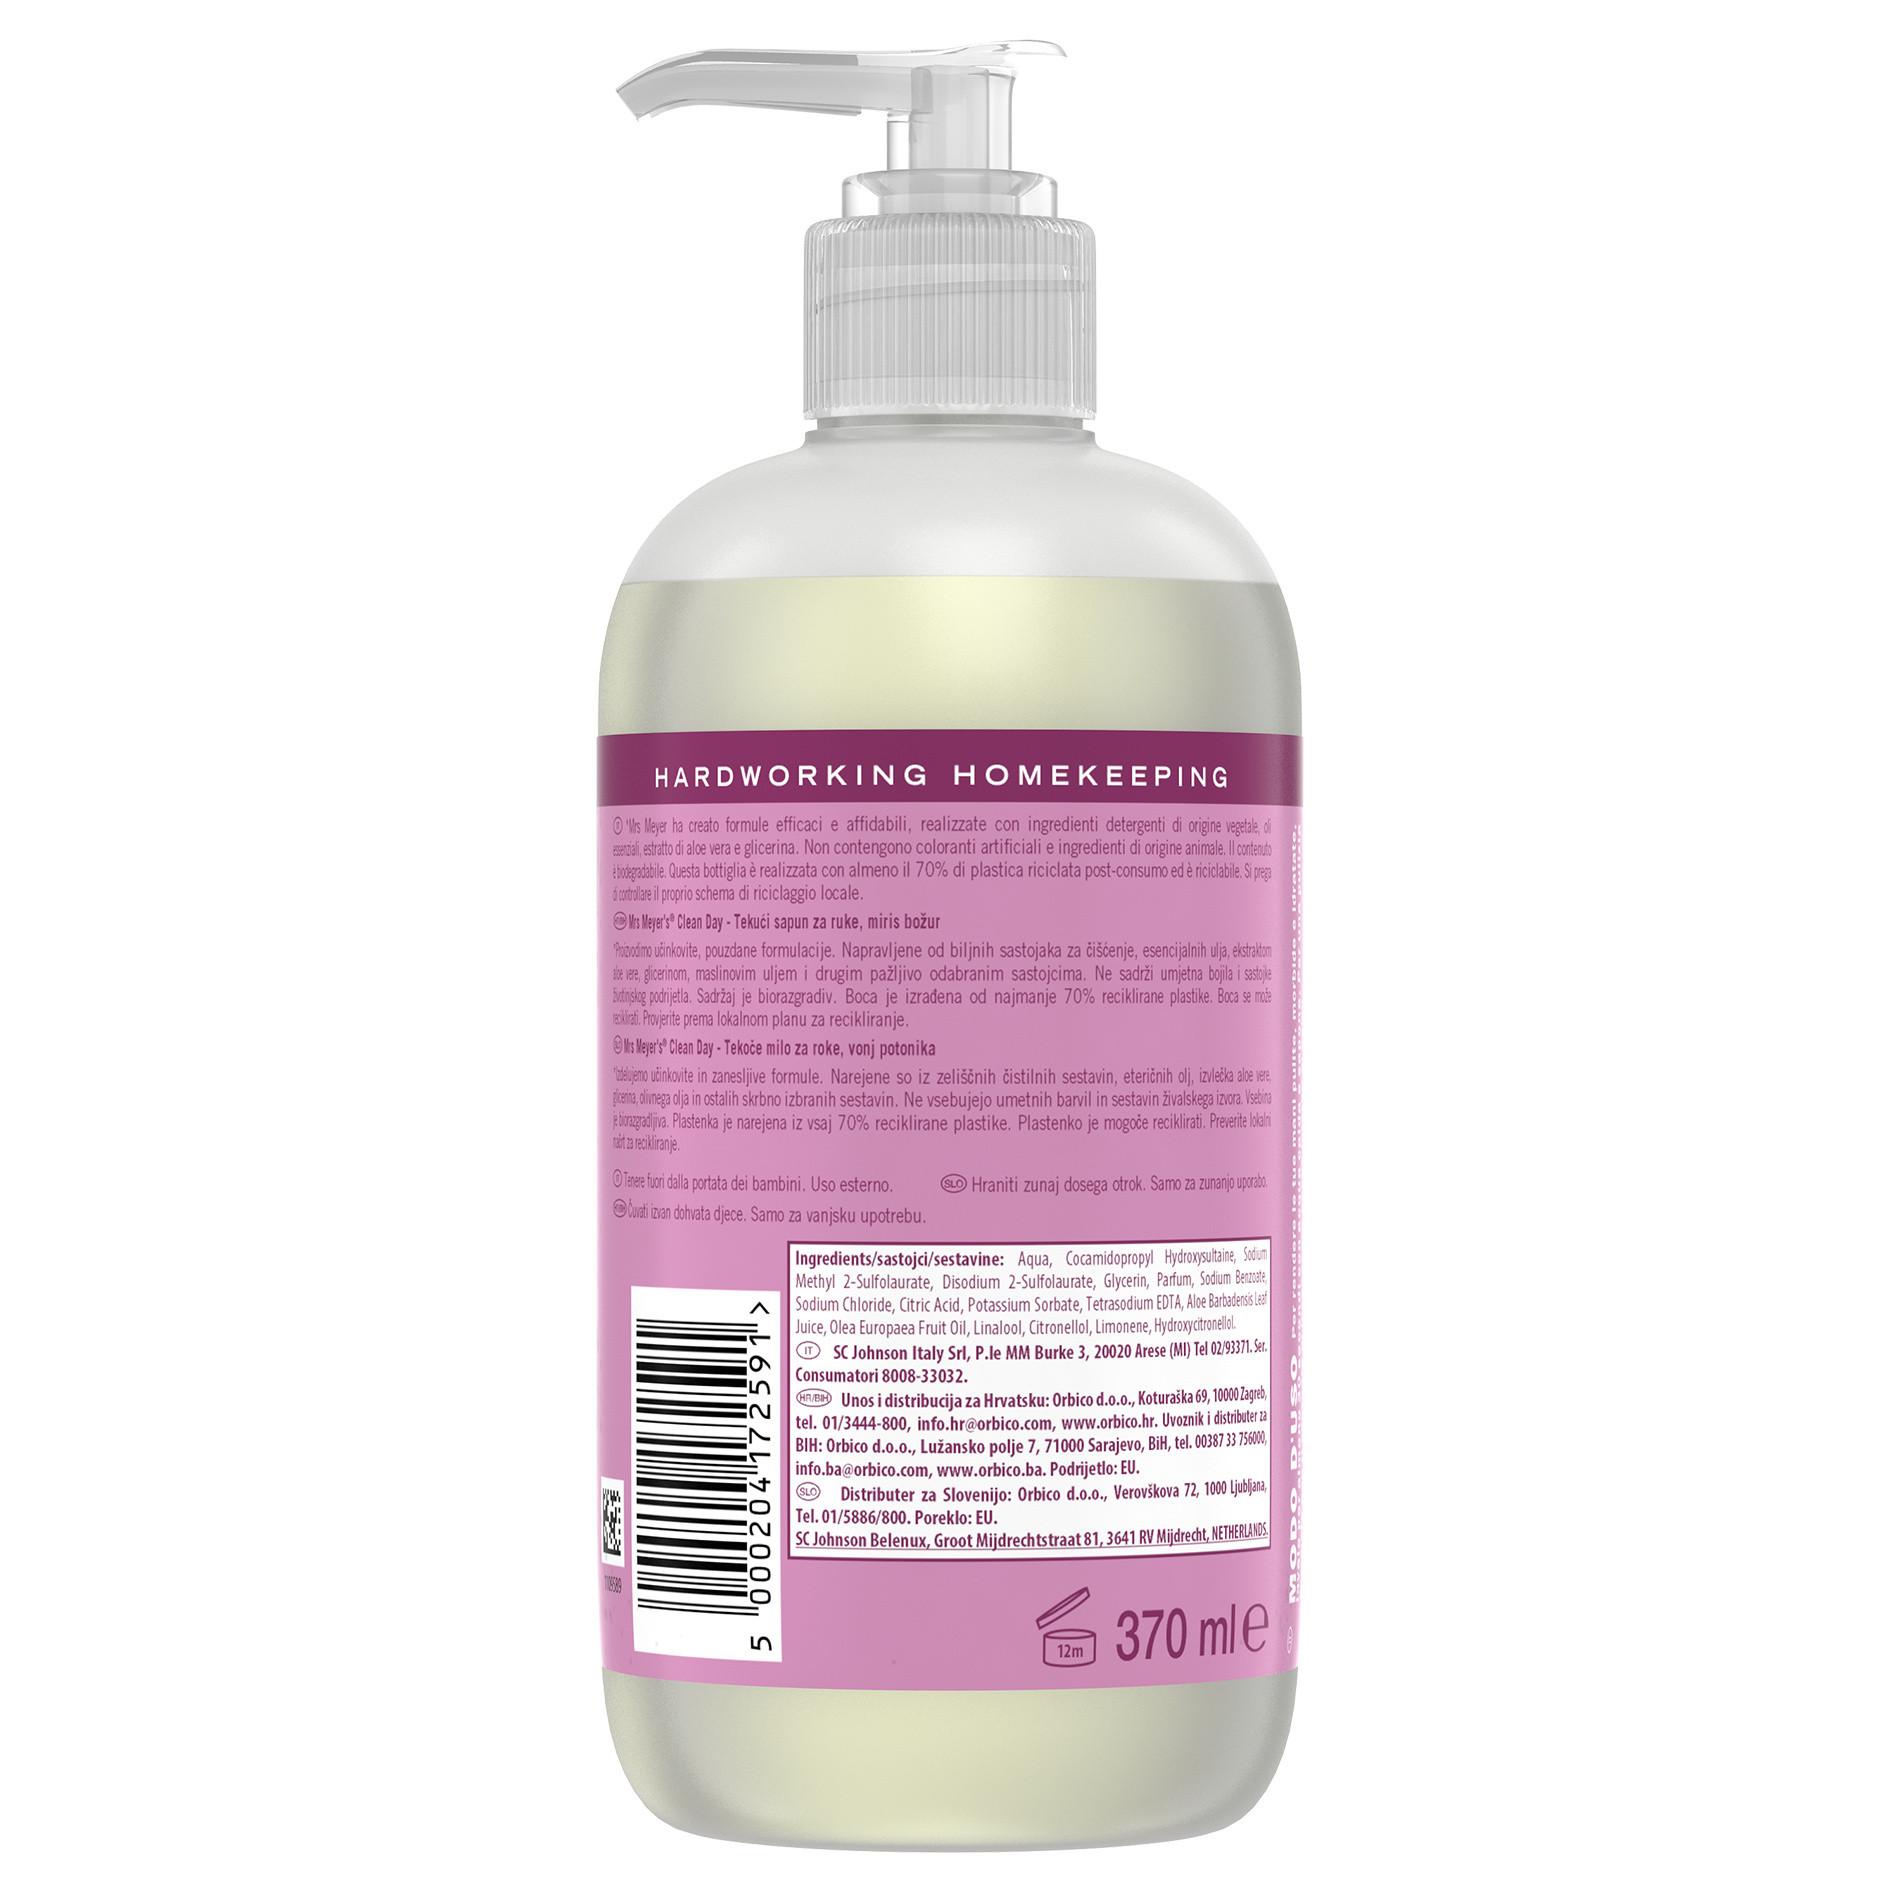 Sapone liquido per mani profumo di peonia 370ml, Rosa, large image number 1